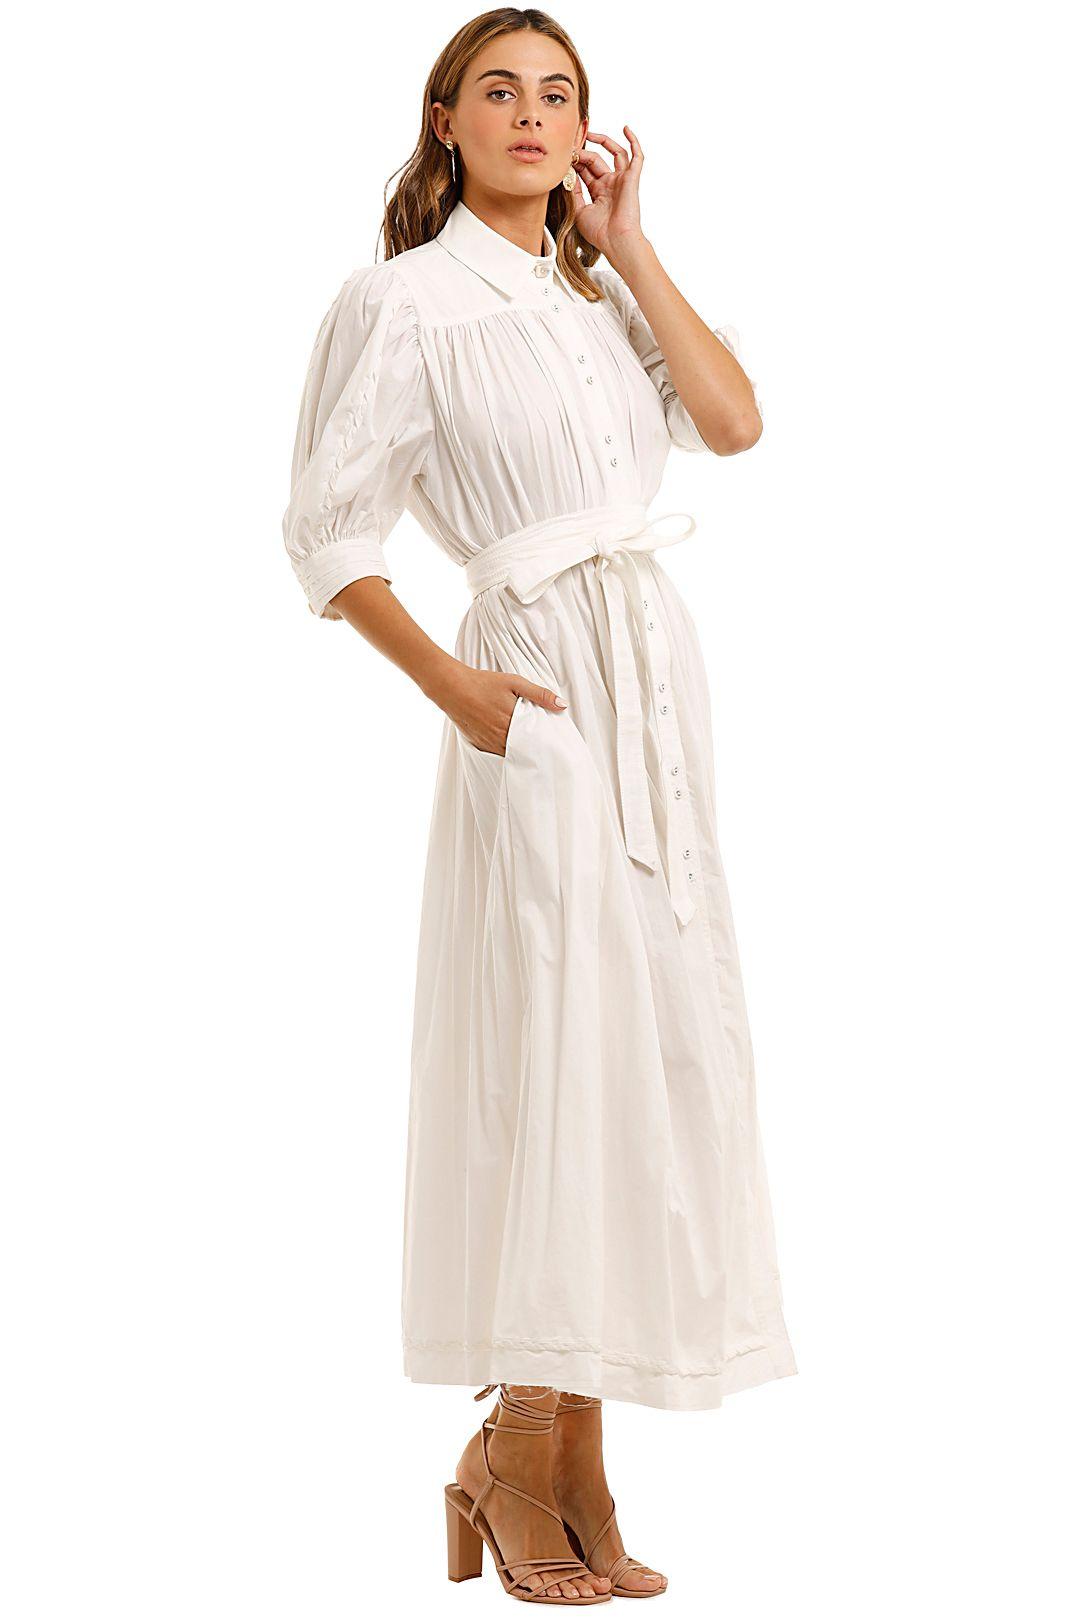 AJE Organic Manifest Dress white belted